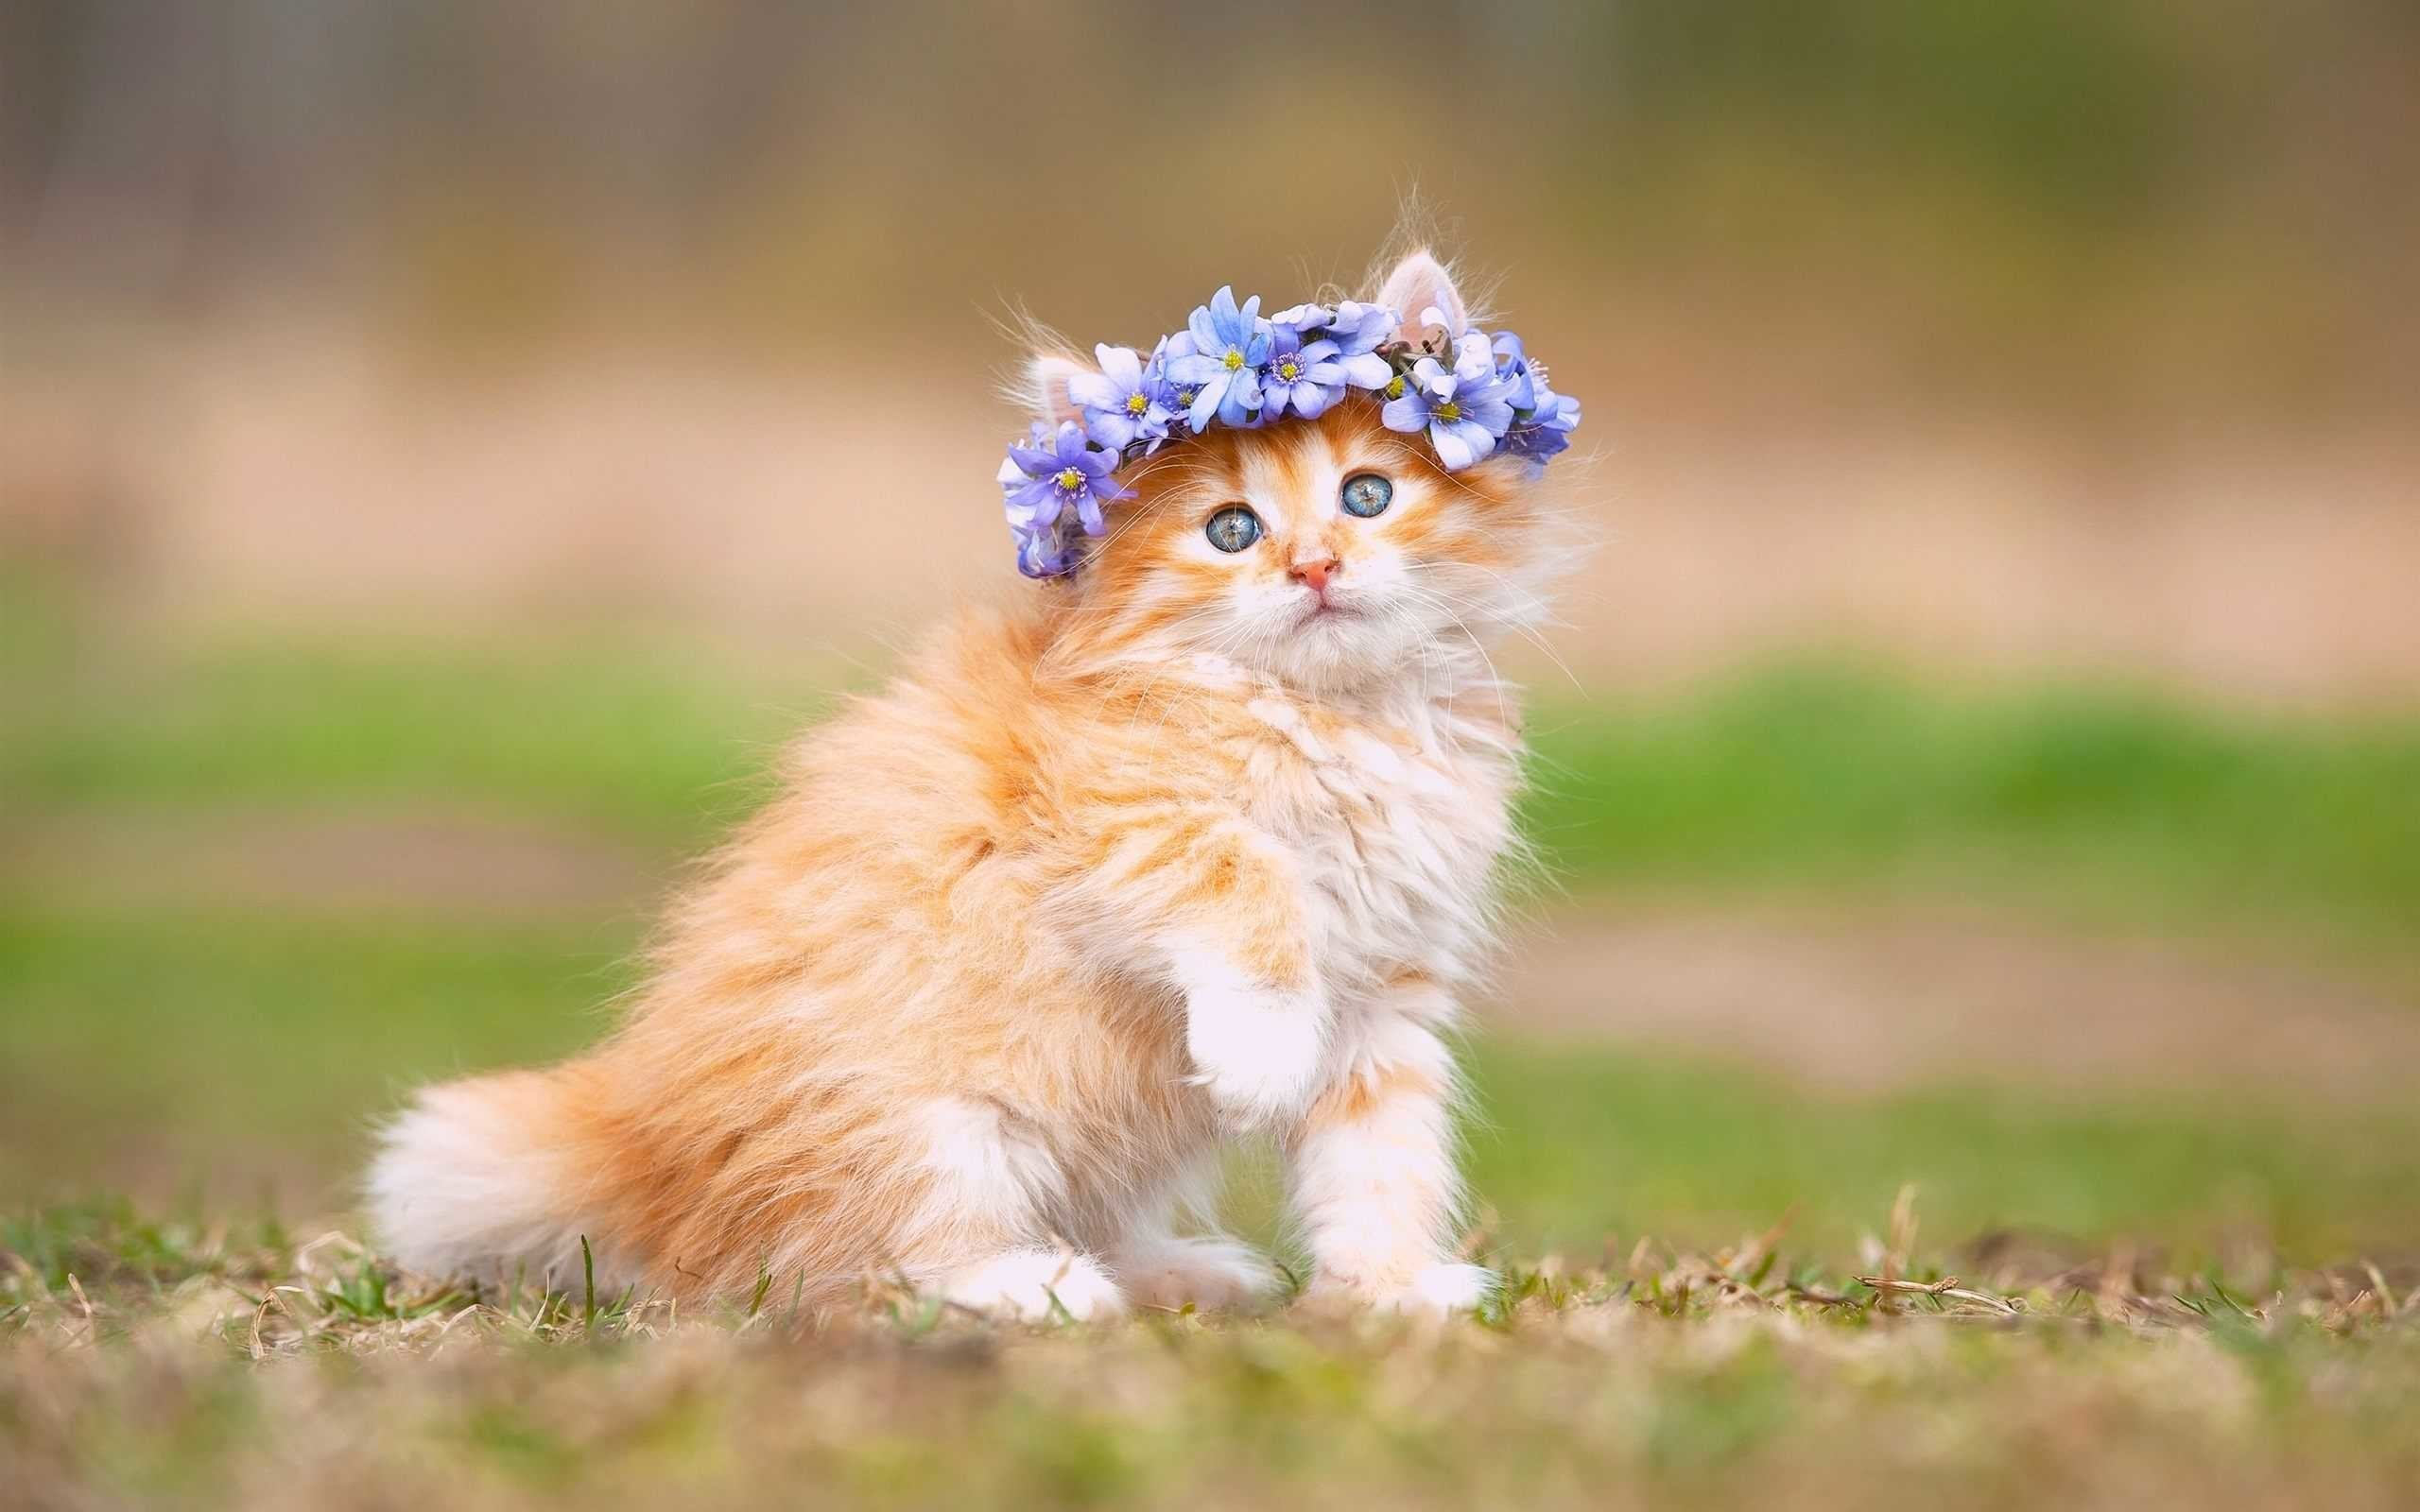 Res: 2560x1600, Cat Hd Kitten Wallpaper Widescreen Cute For Smartphone High Quality